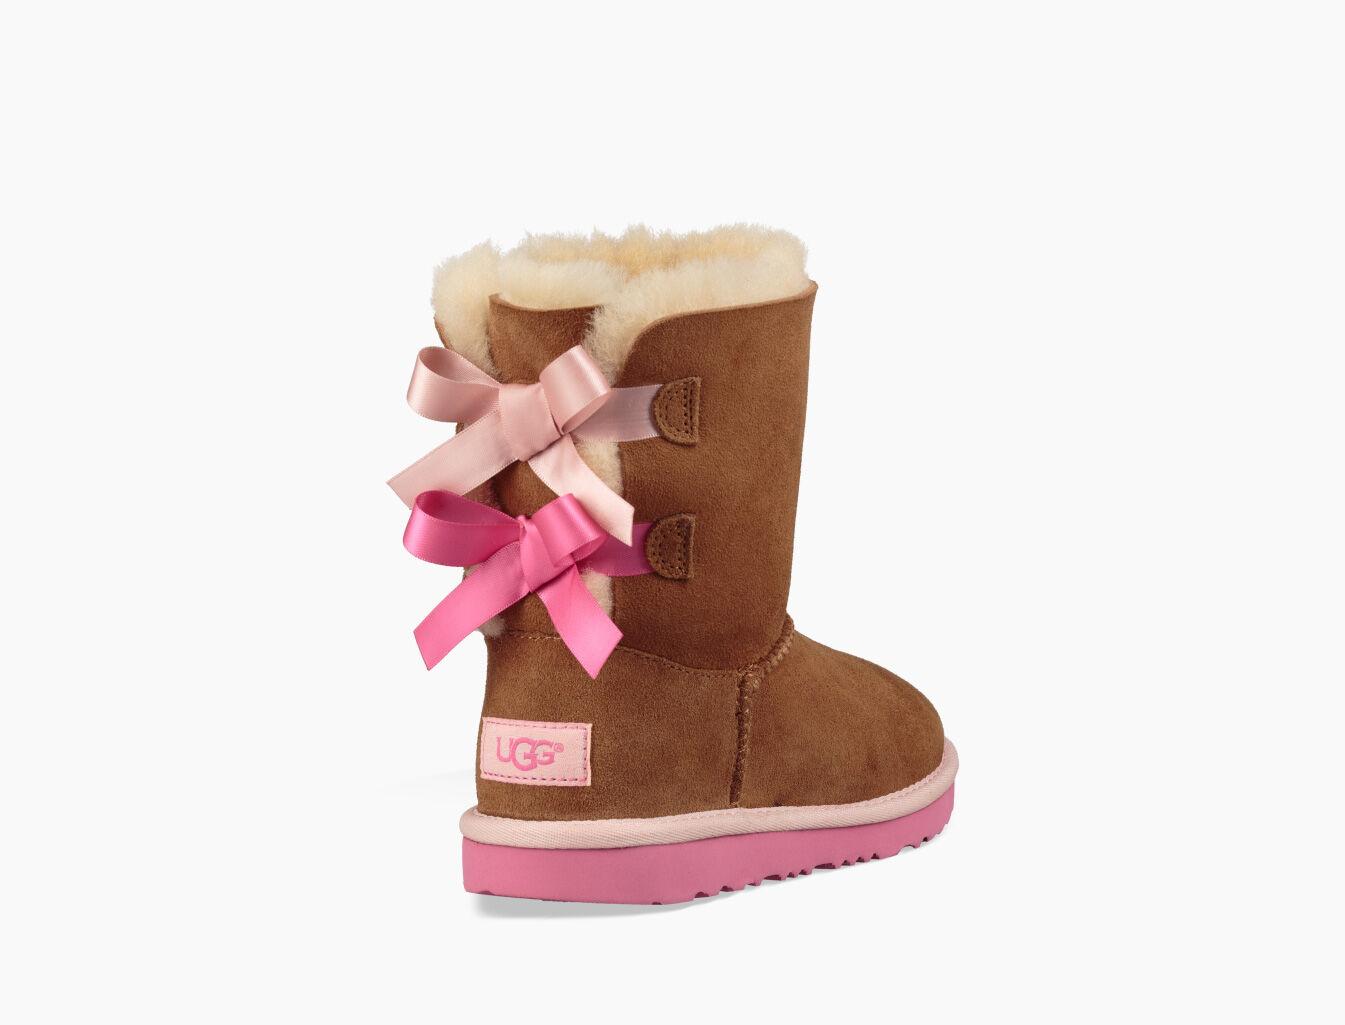 bailey bow ii boot for kids ugg canada rh ugg com